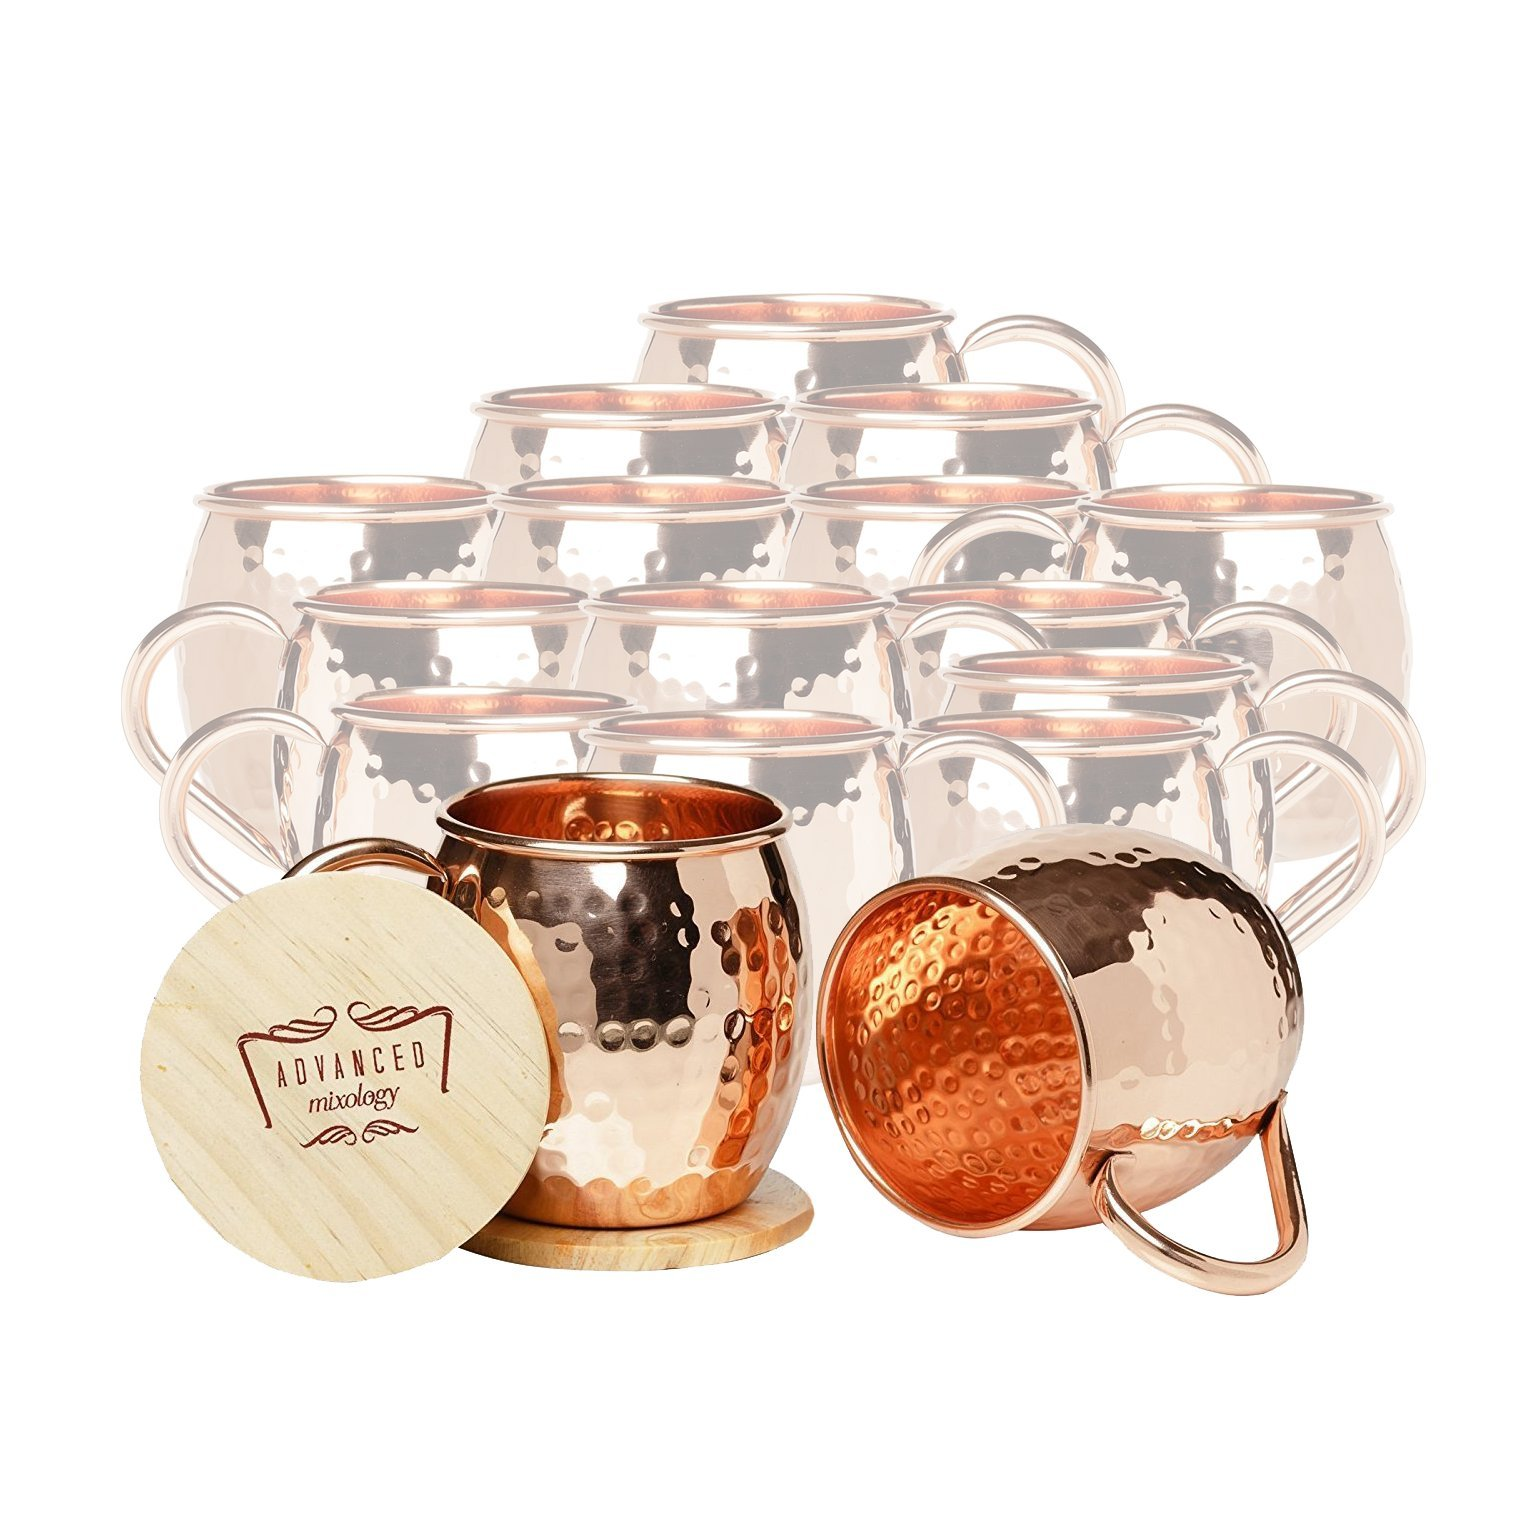 Set of 16 Advanced Mixology Barrel Mugs (Copper Handle)